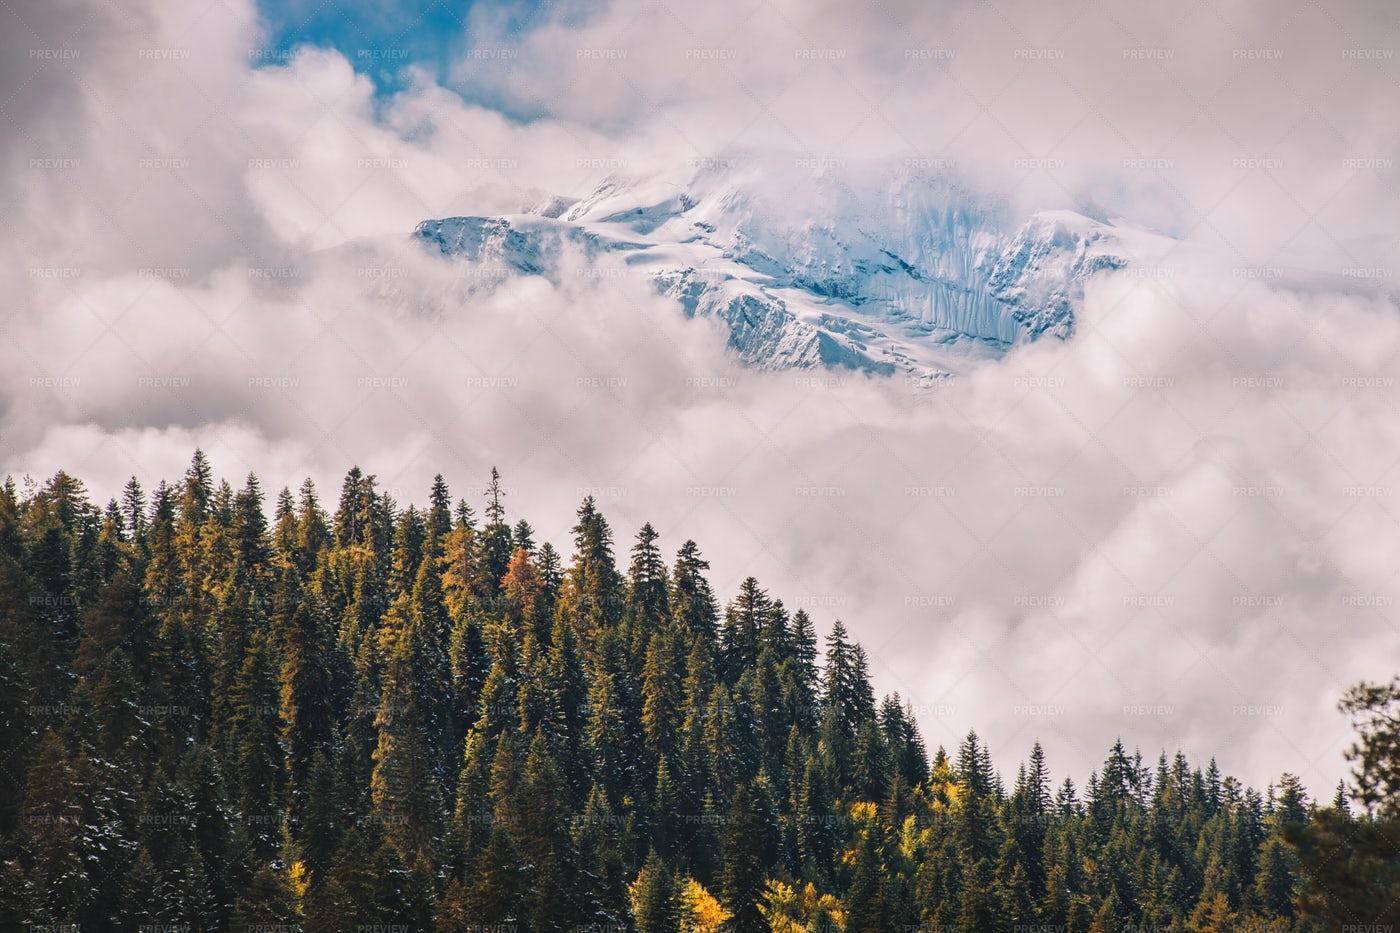 Mountain Forest Beside Snowy Peak: Stock Photos